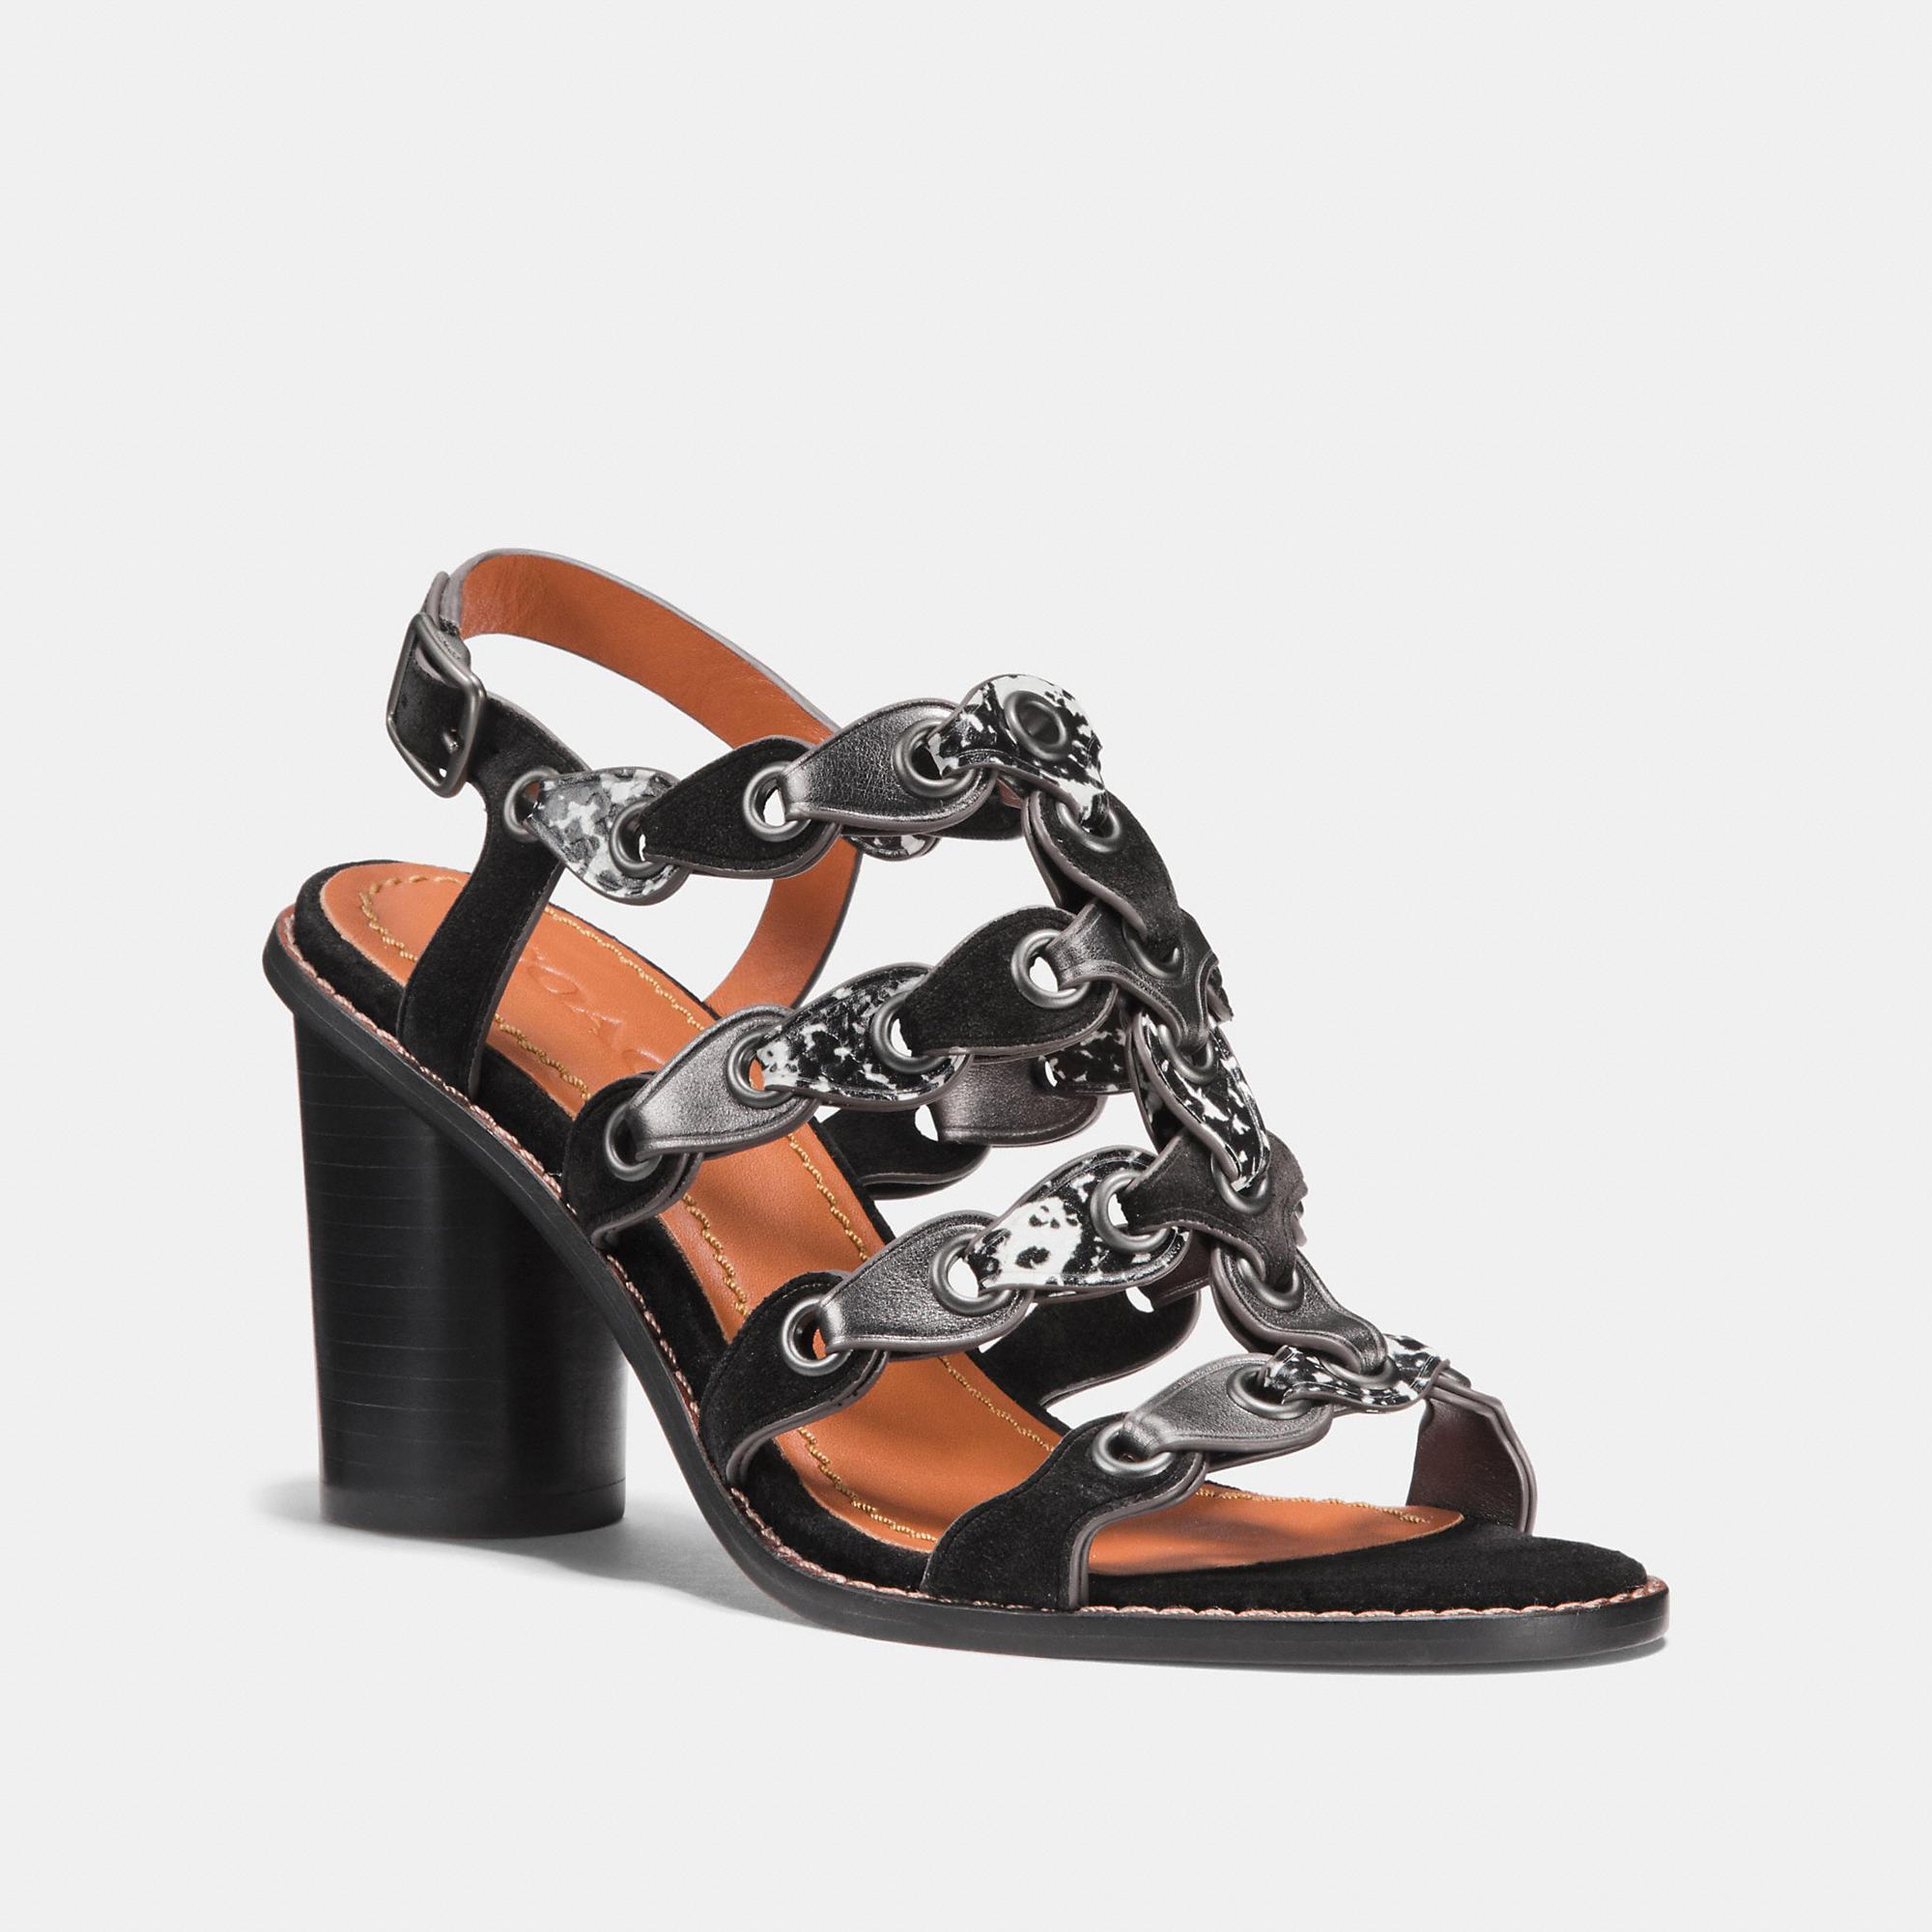 933d55996dd Coach Mid Heel Sandal With Link - Women s In Black Black White Gunmetal